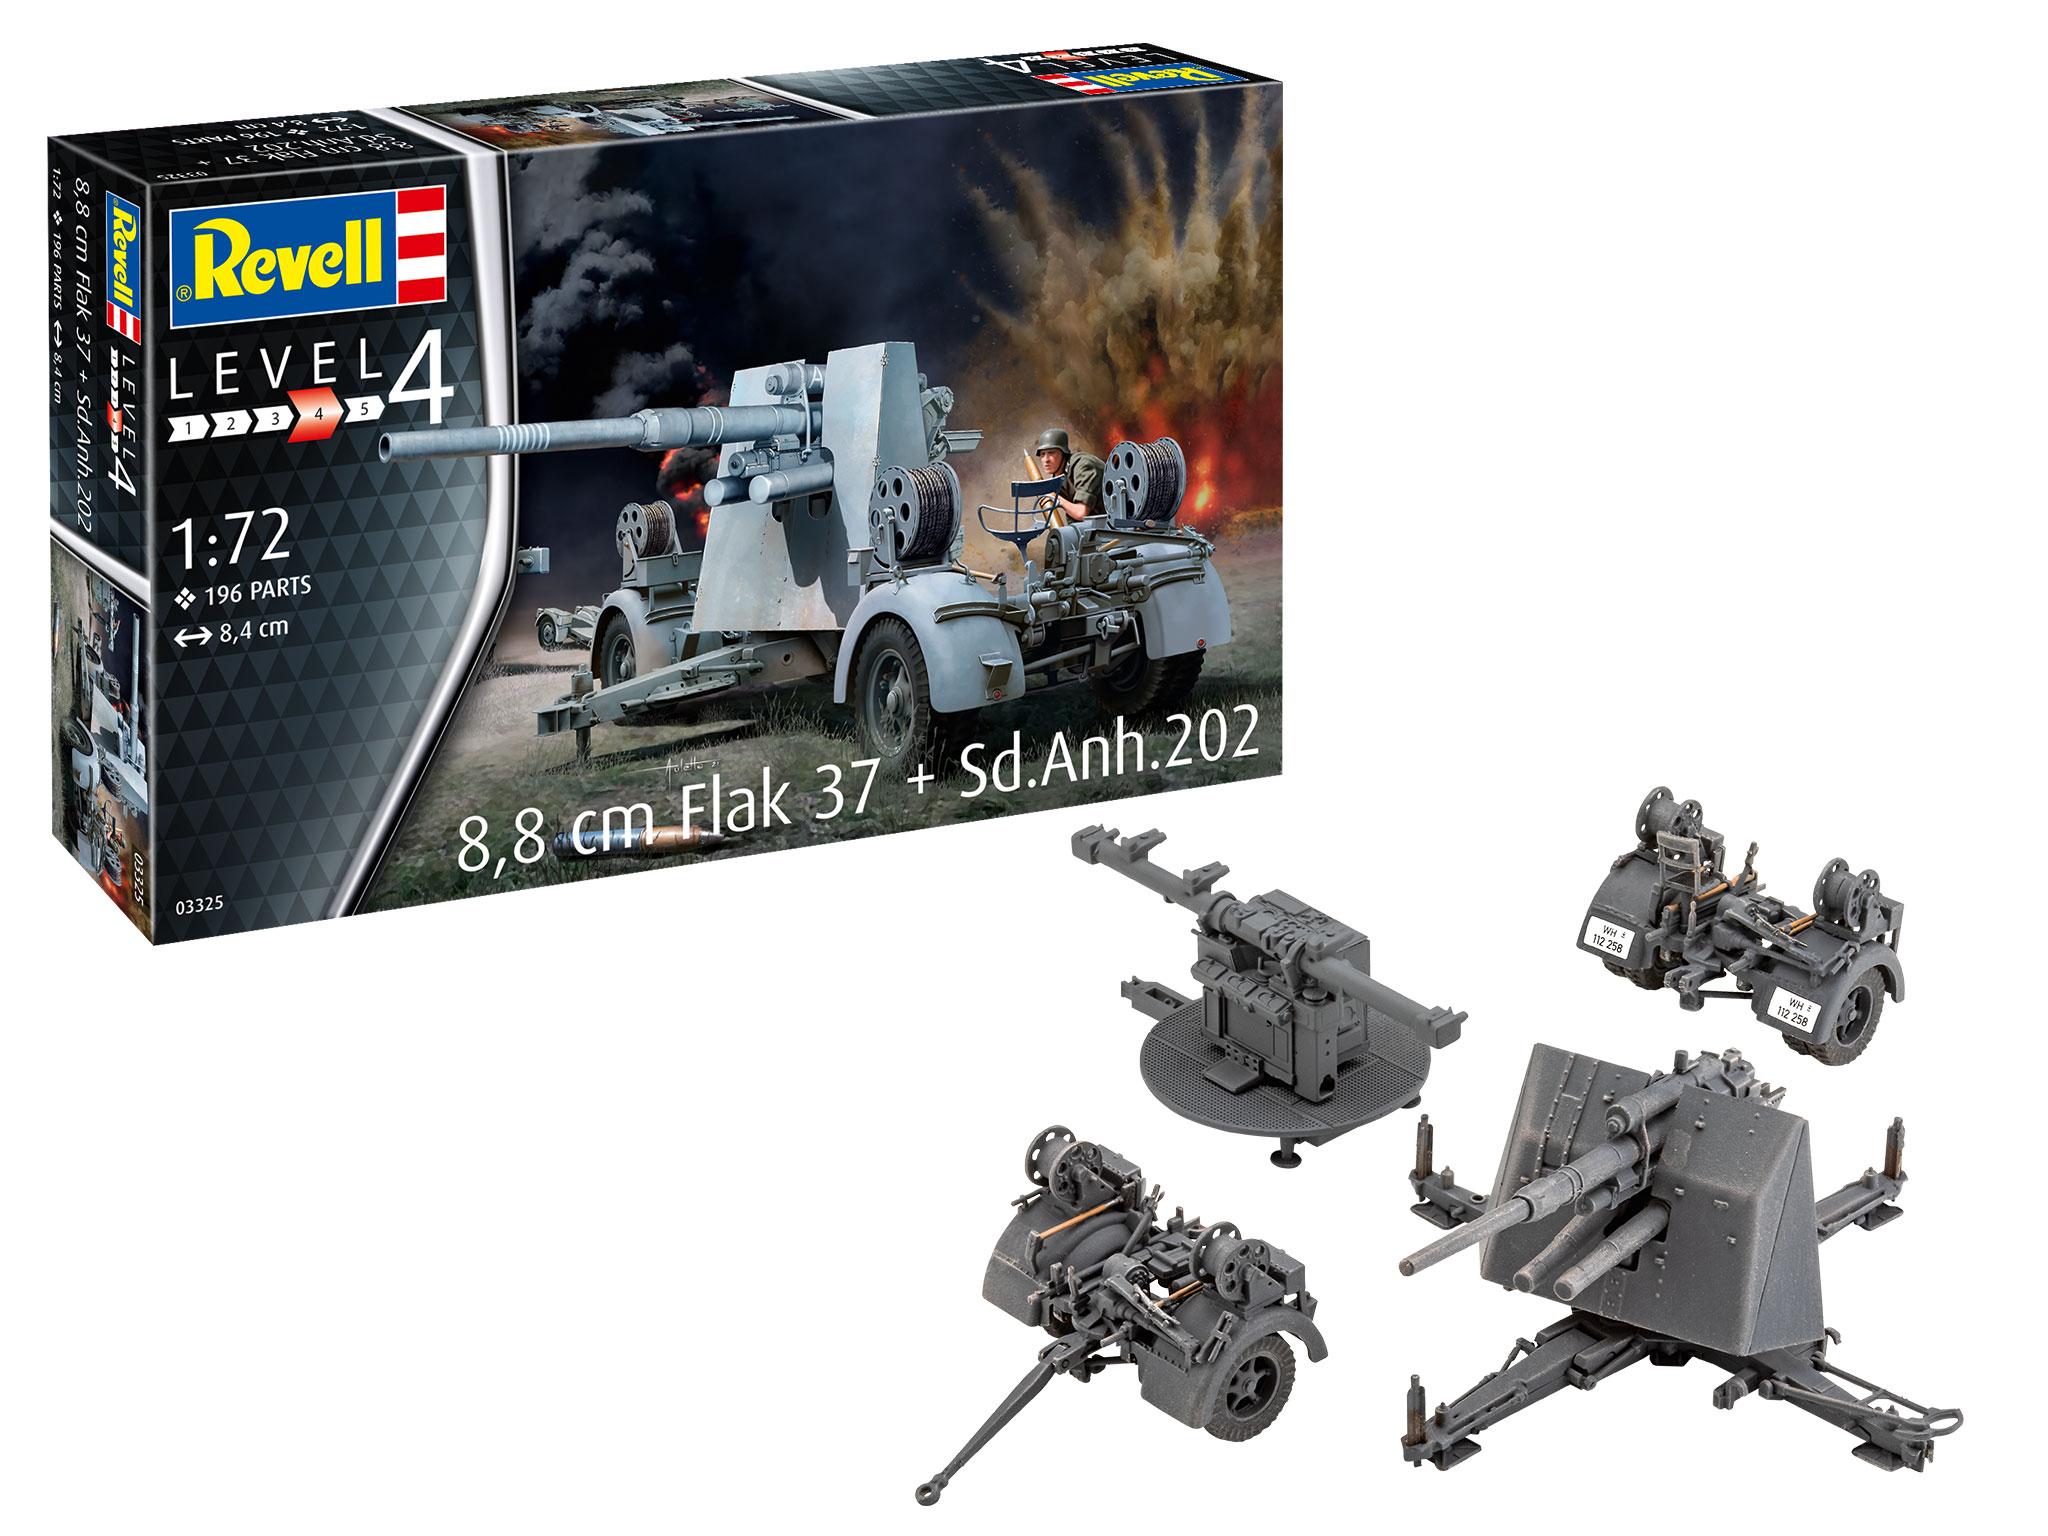 RV3325